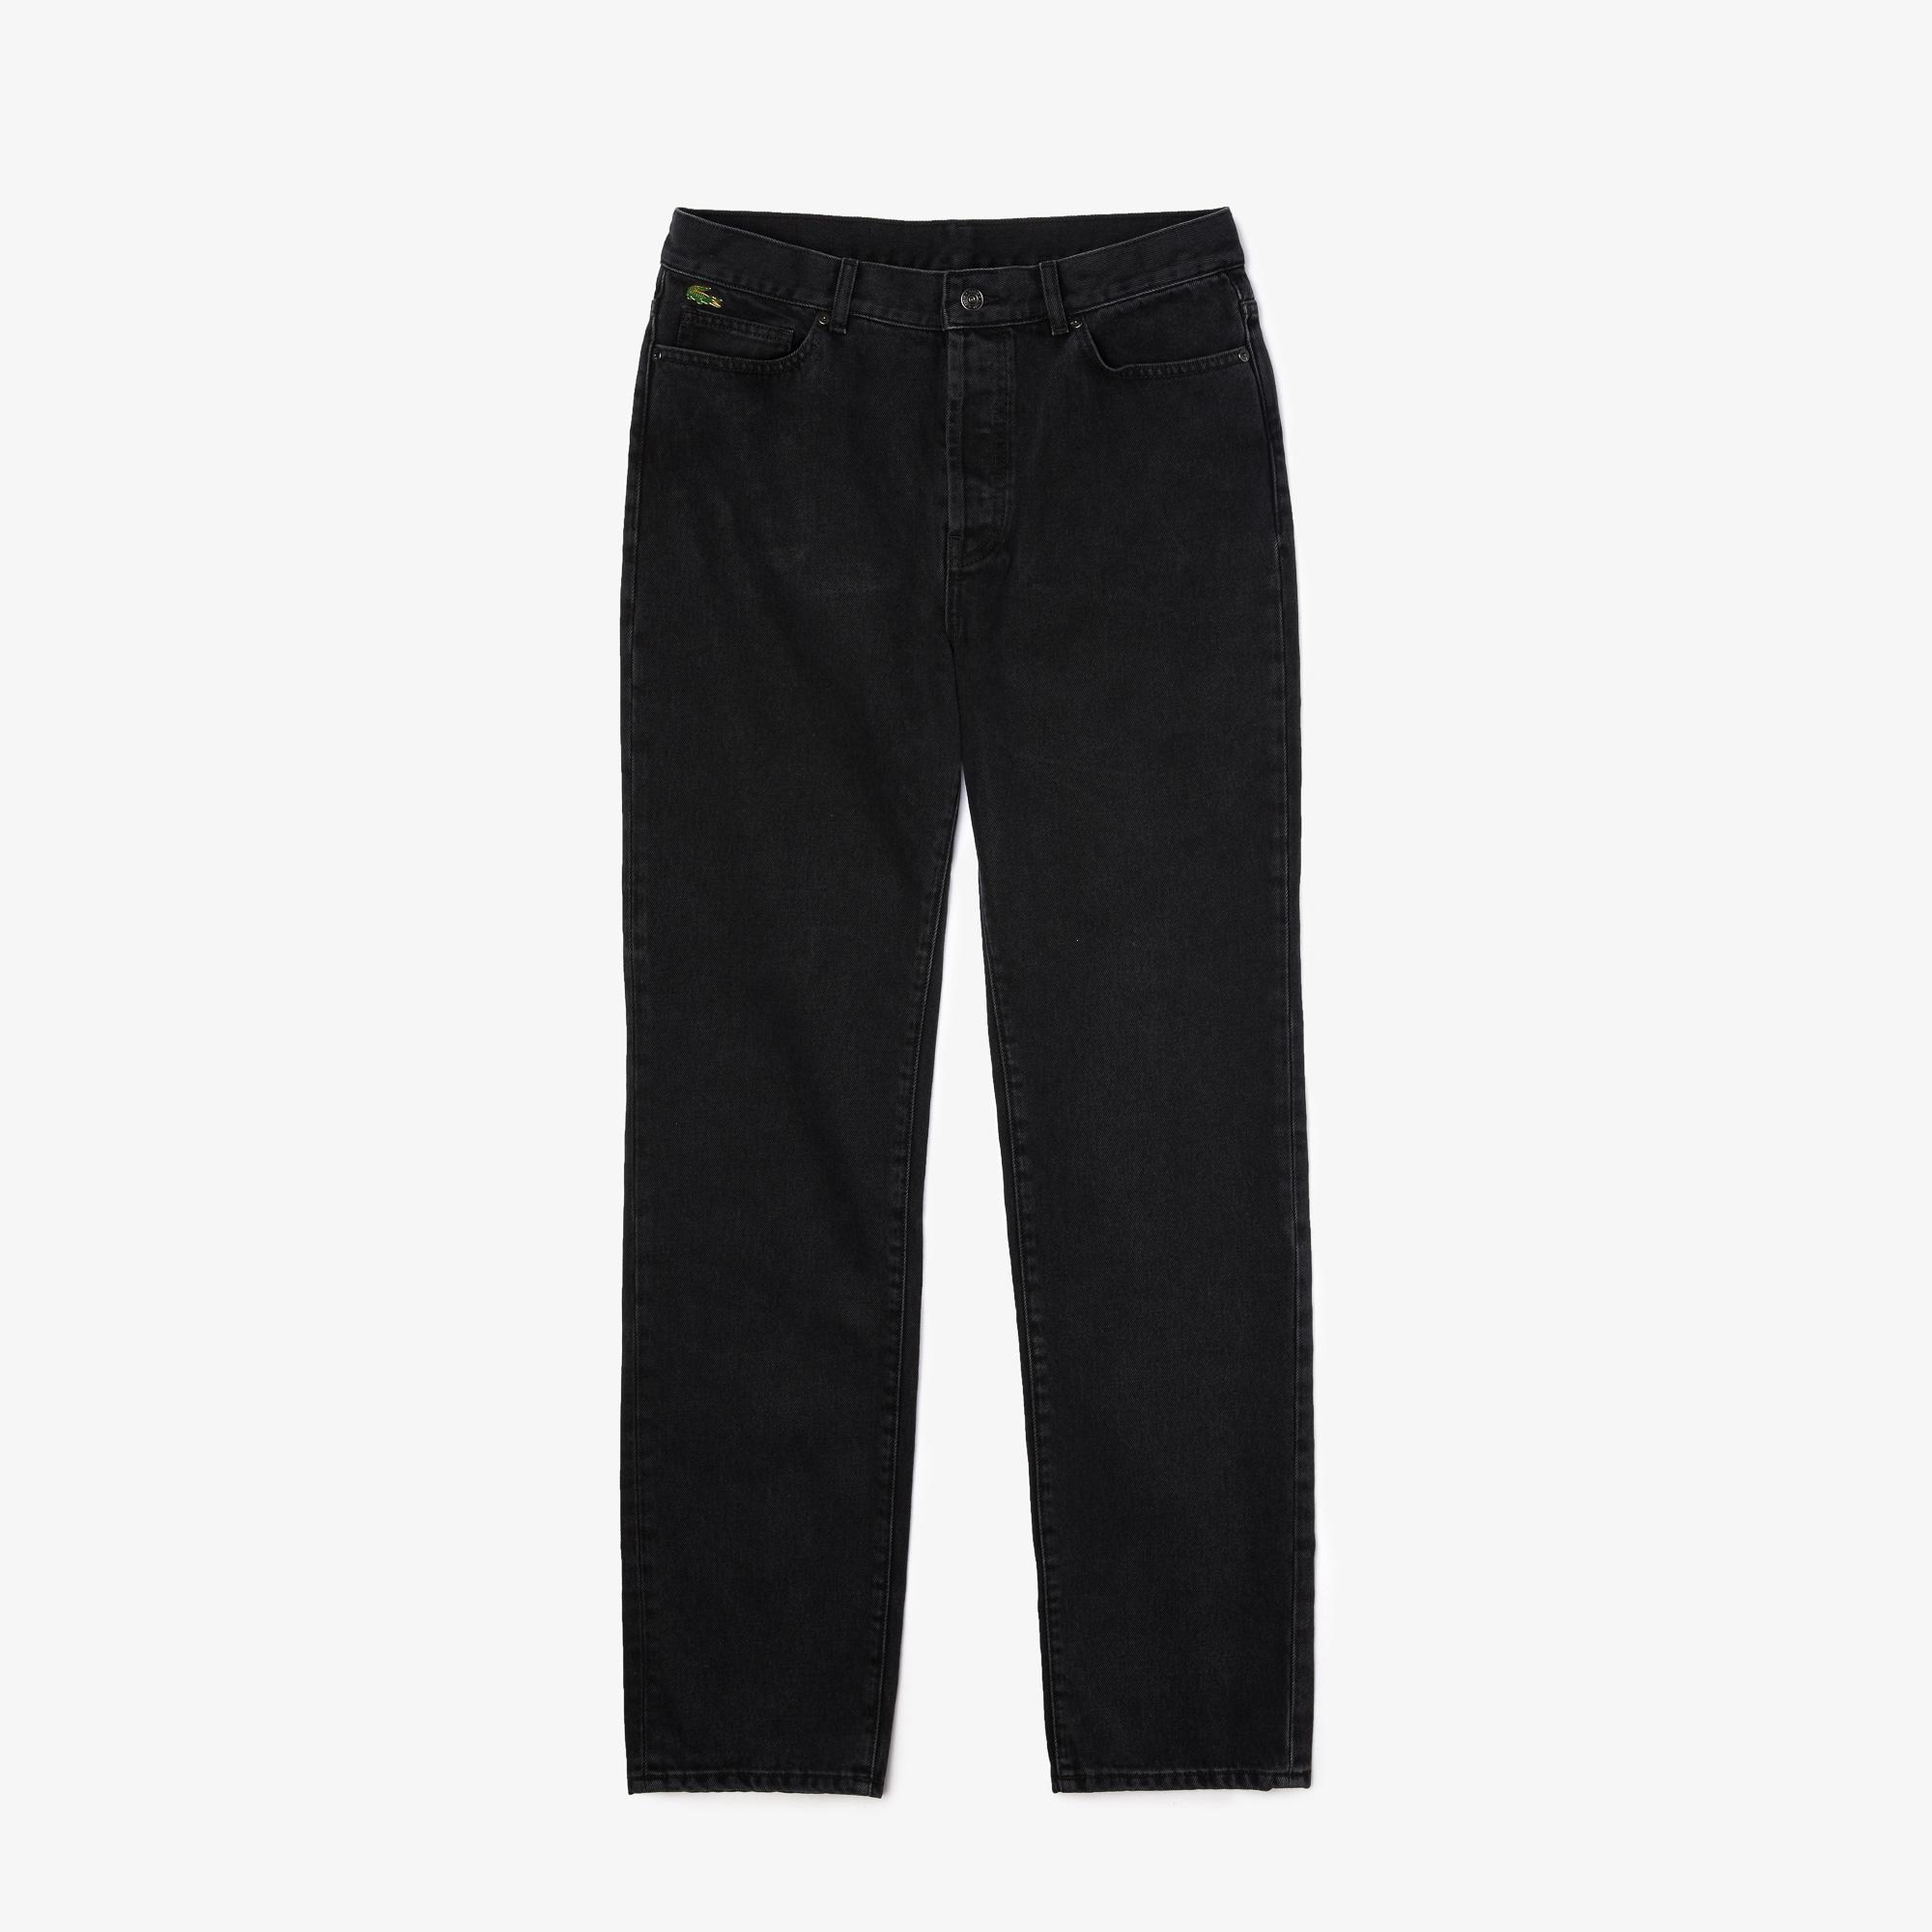 Lacoste L!ve Erkek Siyah Denim Pantolon